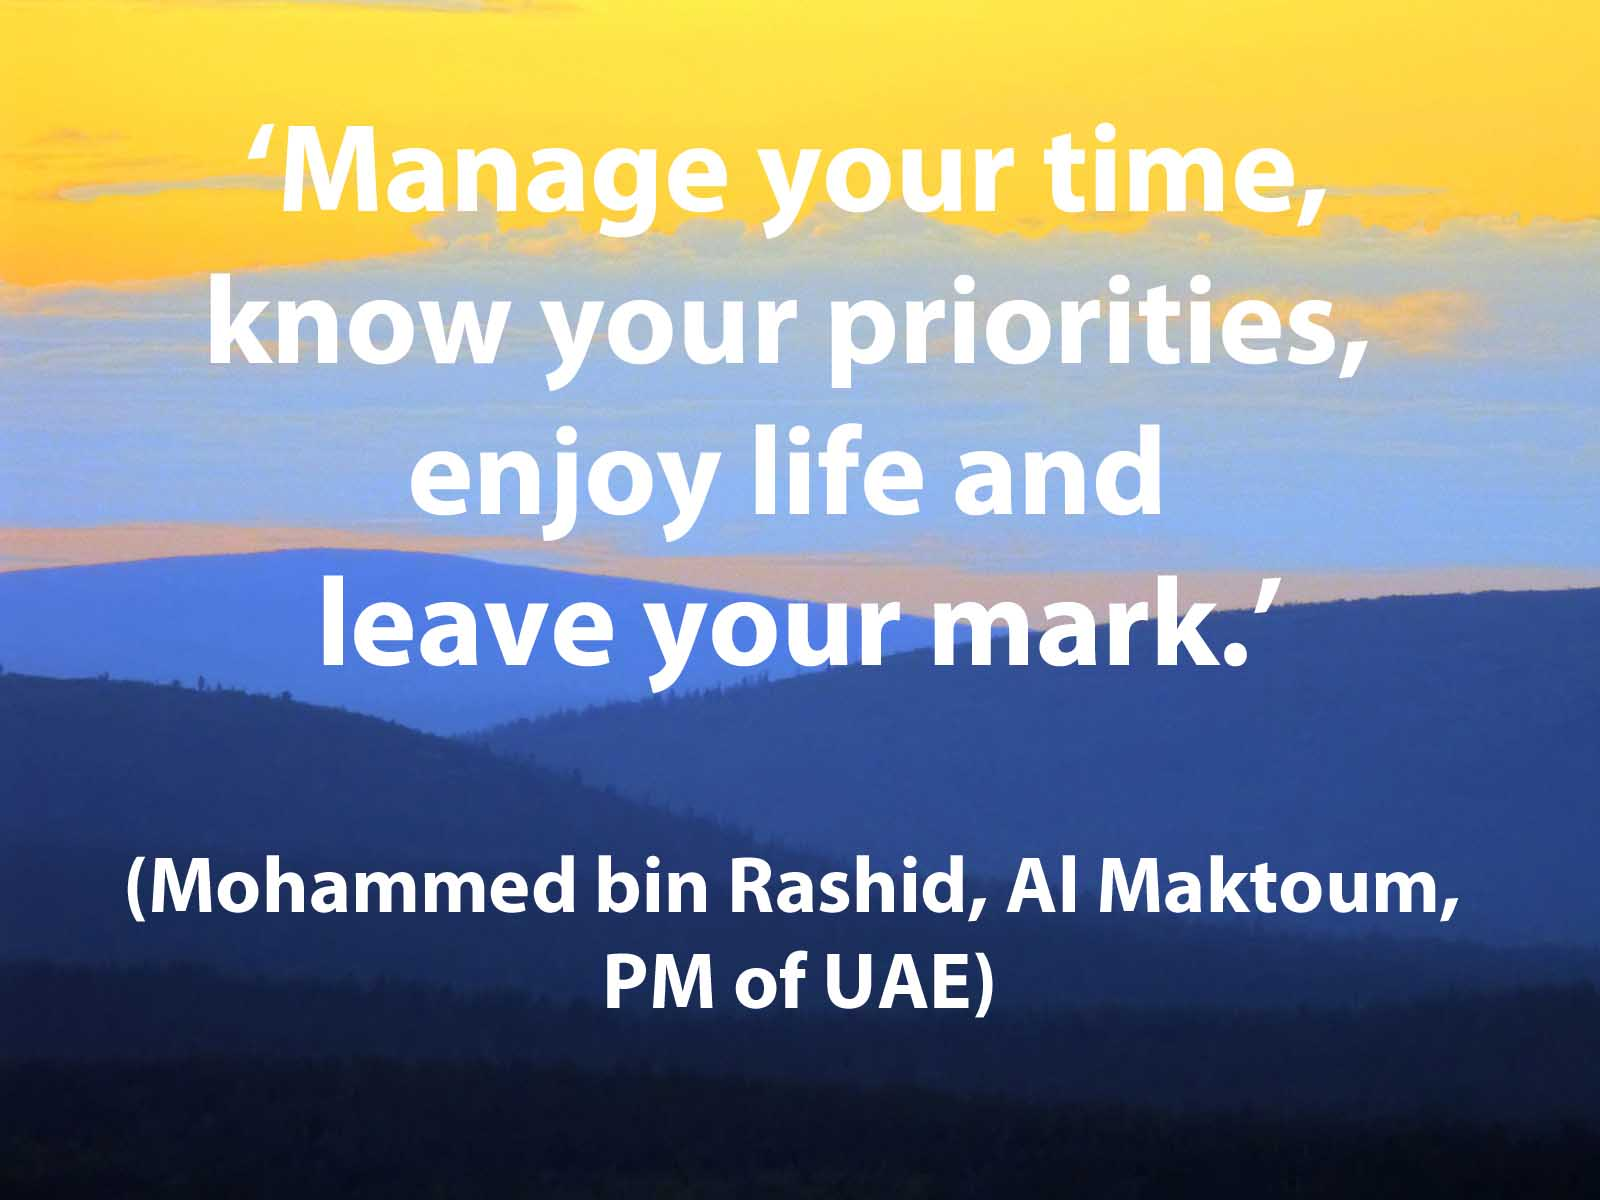 Mohammed bin Rashid quote